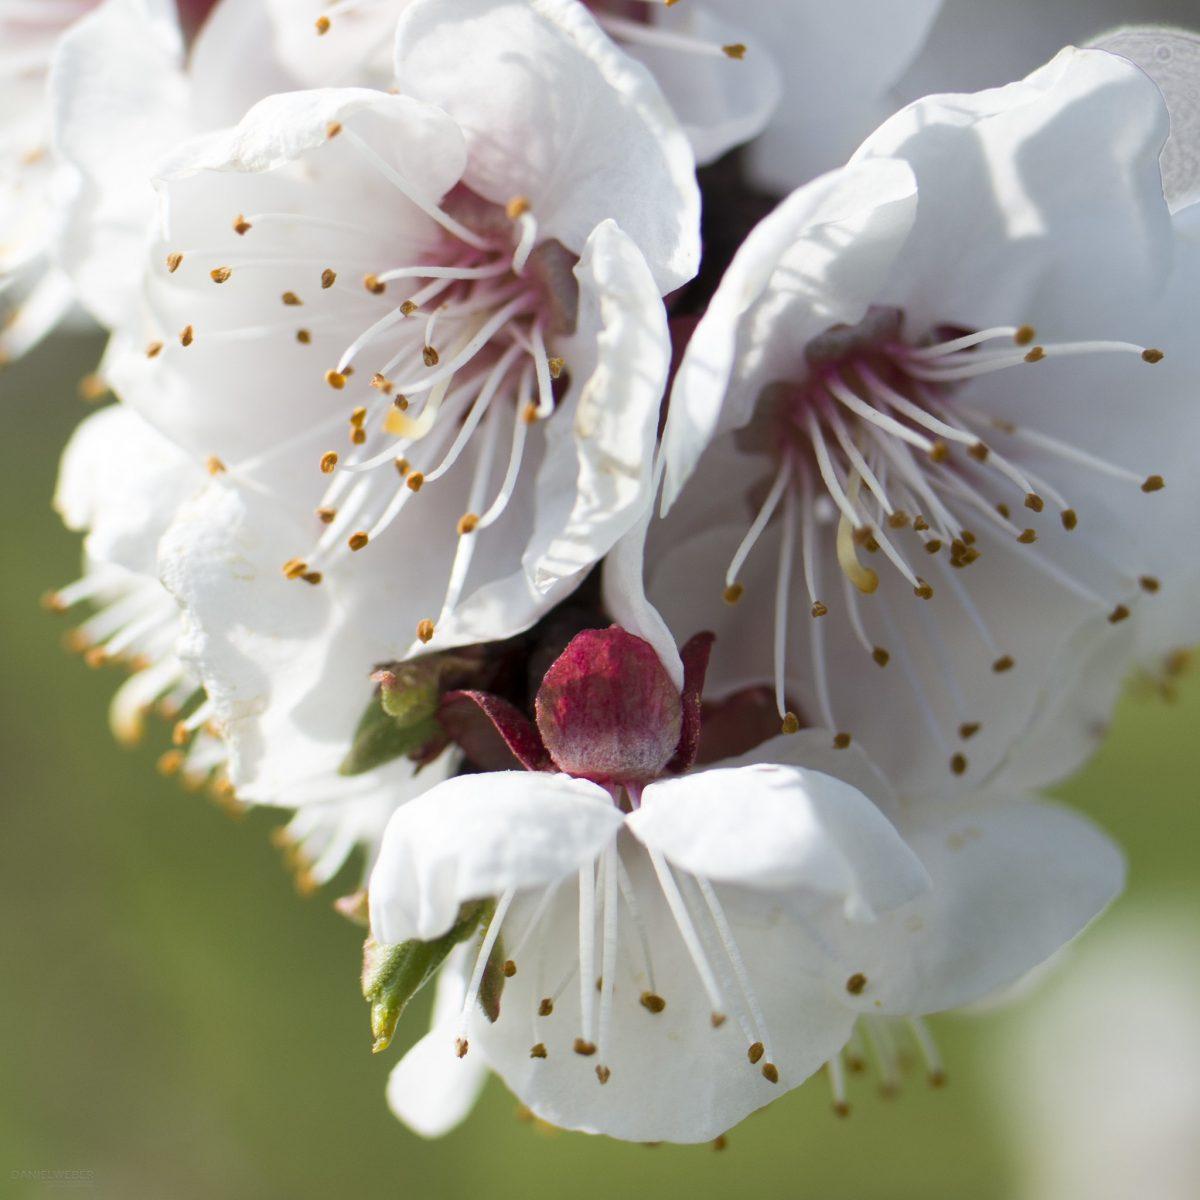 Marillenblüte Wachau